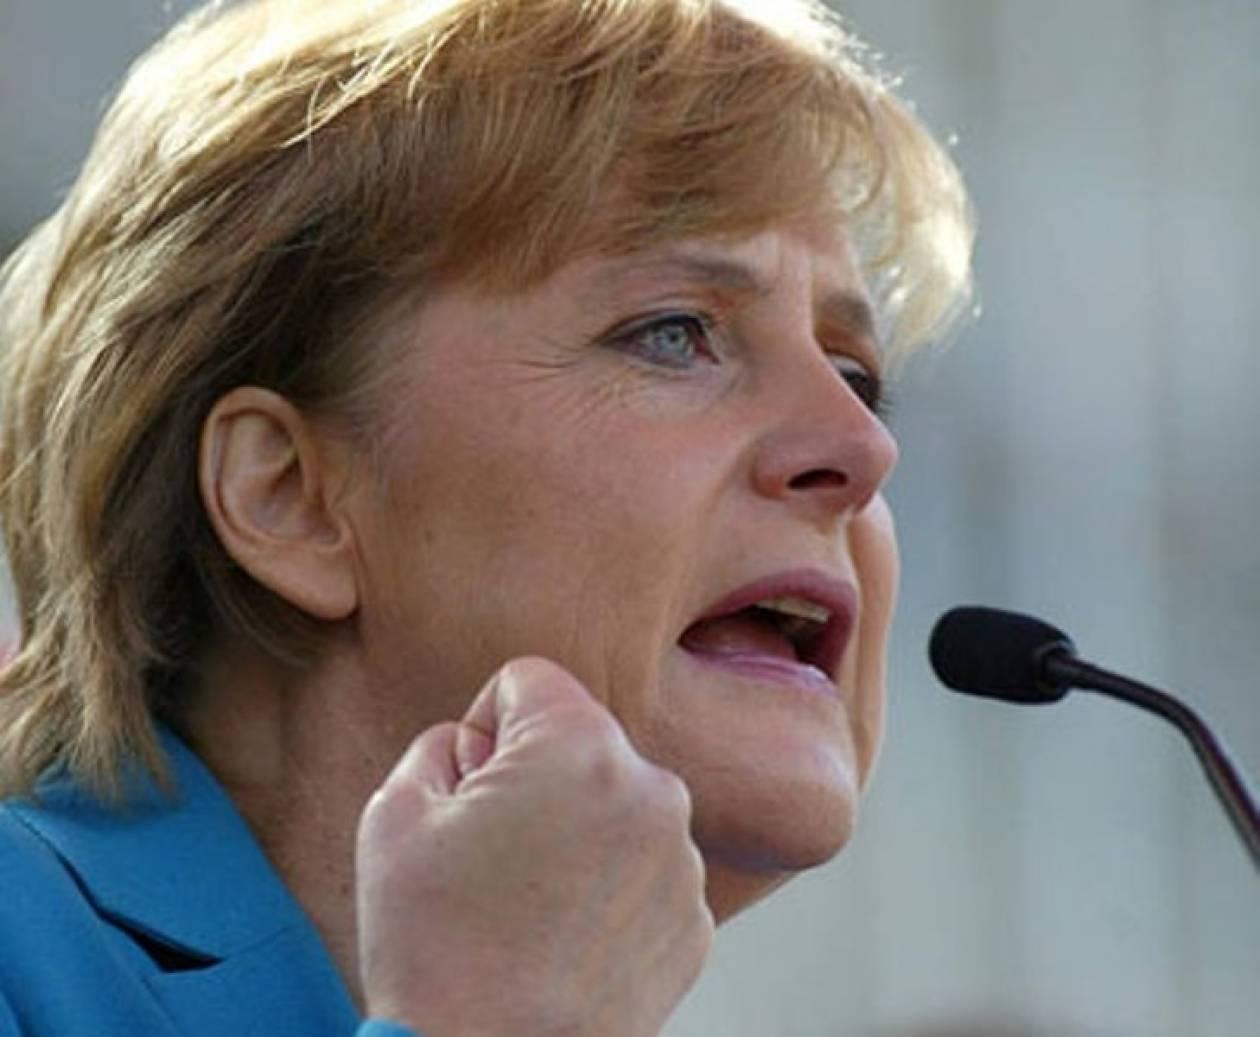 Mέρκελ: «Στα χειρότερά της, η Ευρώπη»